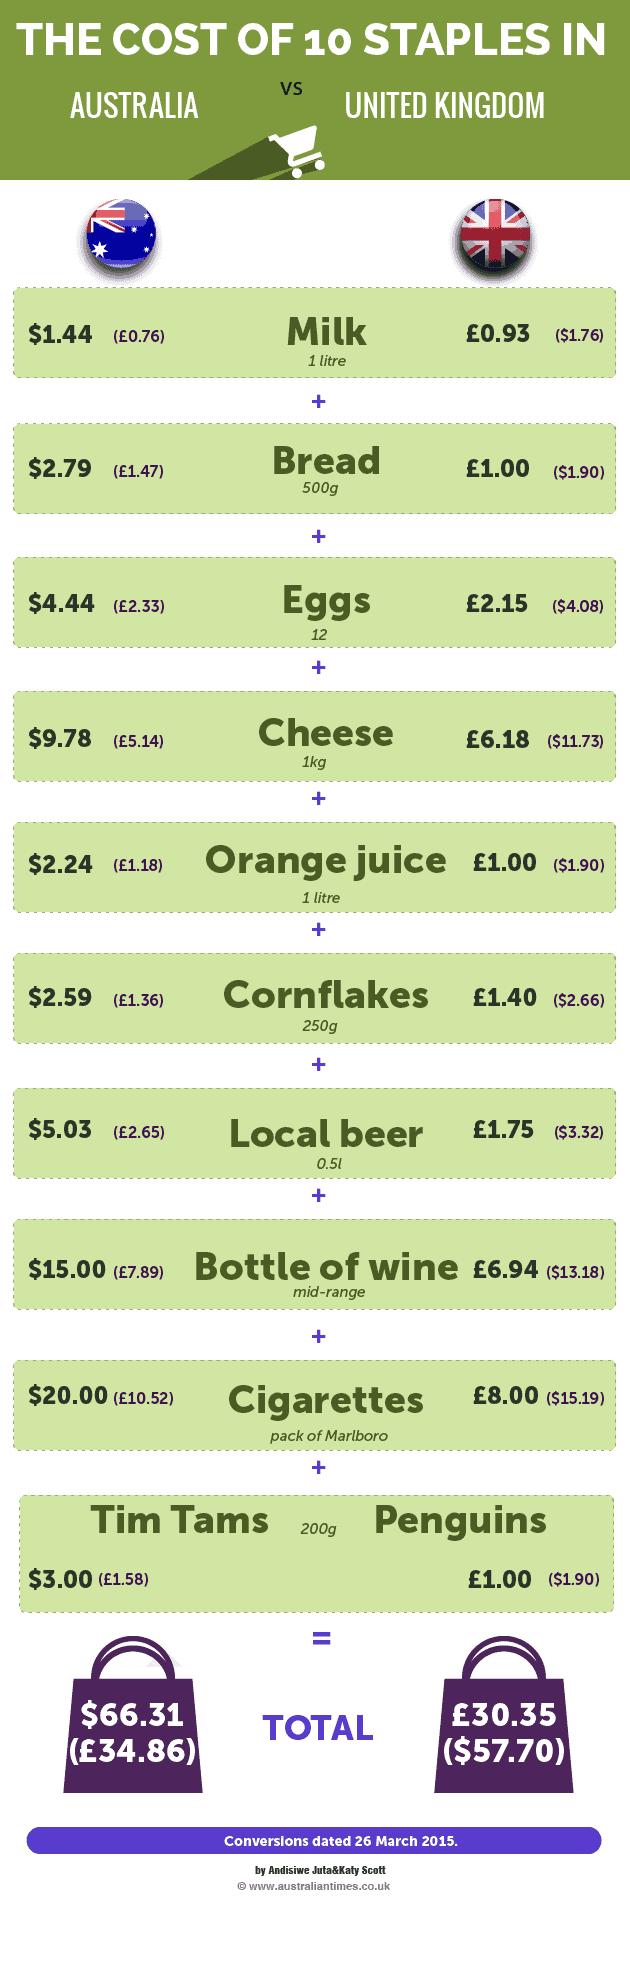 Australia vs UK: Groceries cost of living comparison infographic